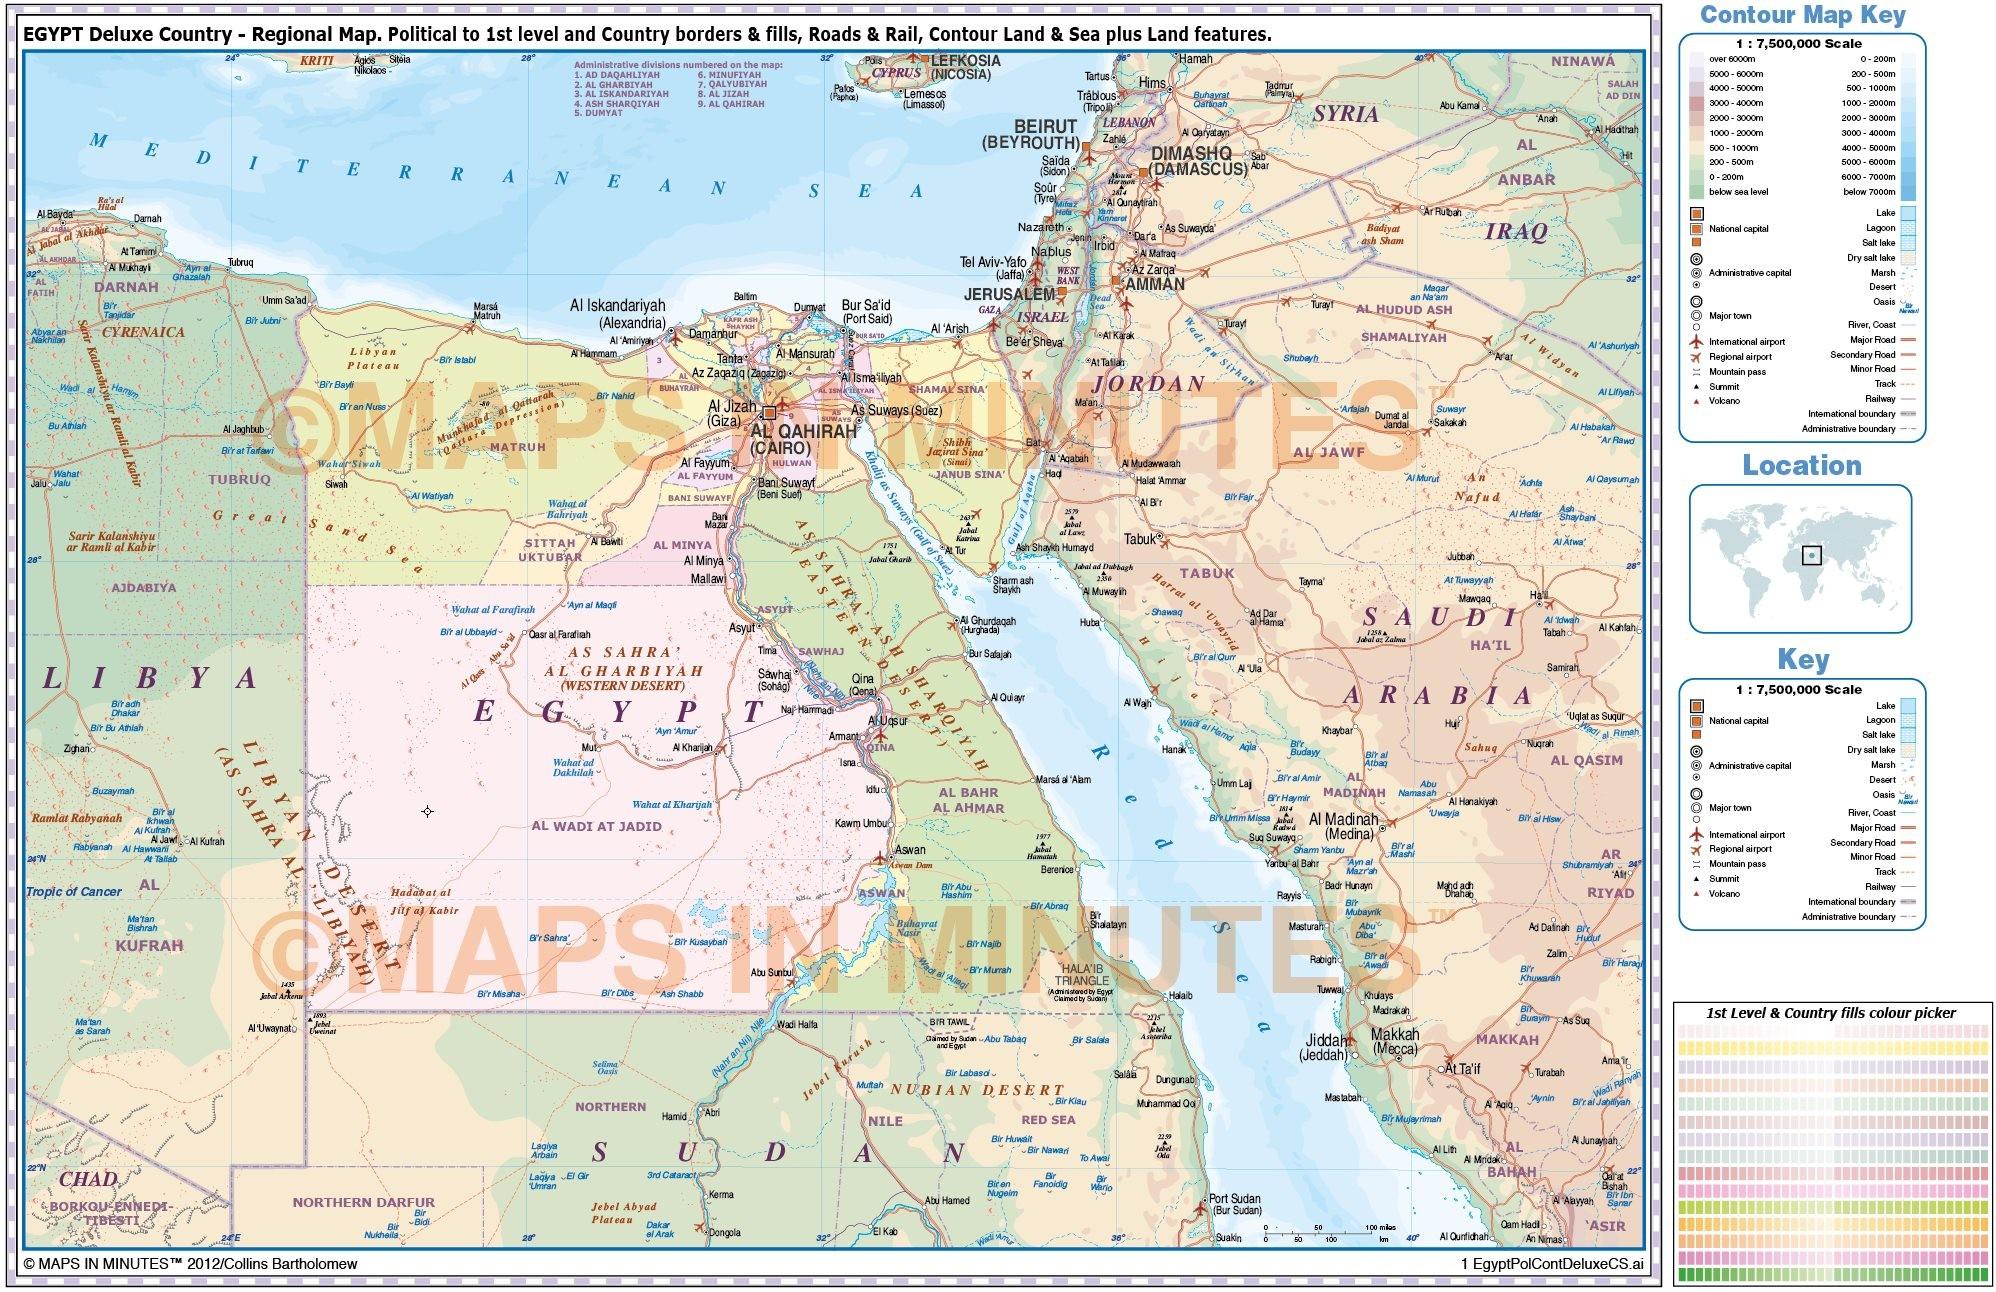 Egypt digital vector political, road & rail map in ... on dubai map, khartoum map, alexandria map, aleppo map, casablanca map, shiraz map, jakarta map, tehran map, medina map, tahrir square map, addis ababa map, paris map, africa map, constantinople map, kabul map, pyramid of giza map, cape town on map, mombasa map, lagos map, jerusalem map,